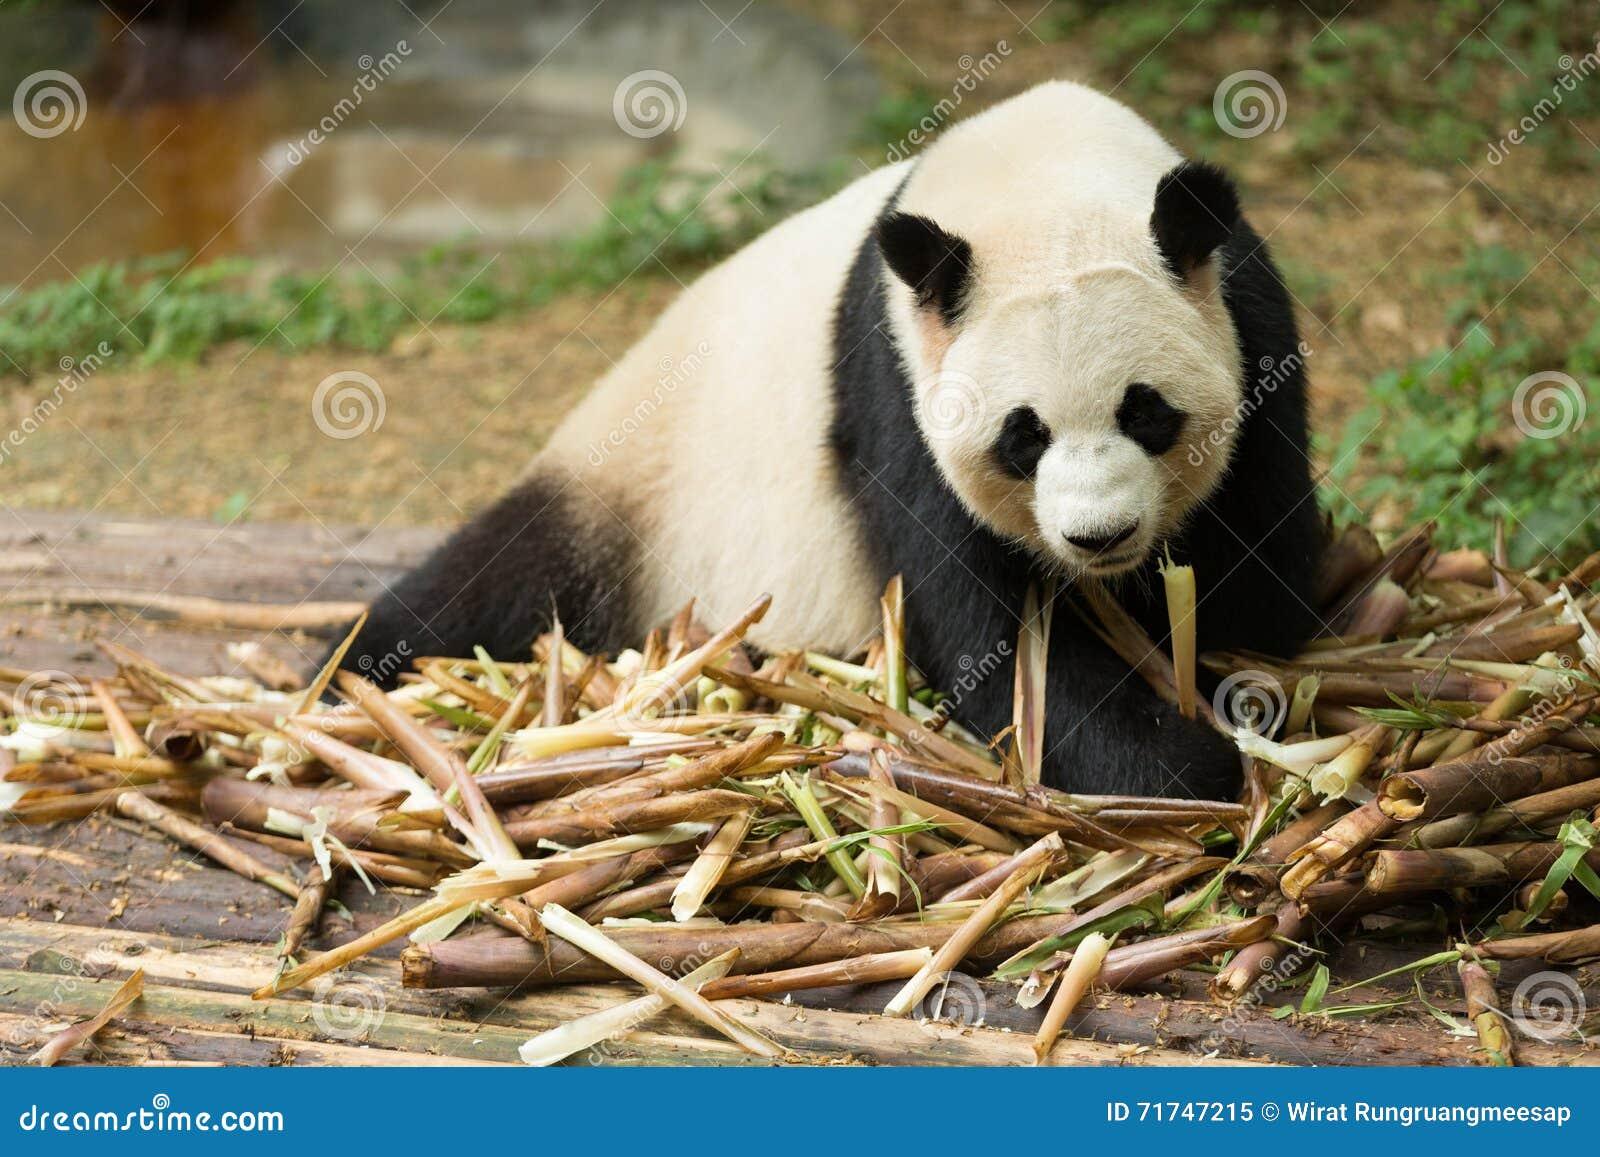 der gro e panda der bambus schaut stockfoto bild 71747215. Black Bedroom Furniture Sets. Home Design Ideas